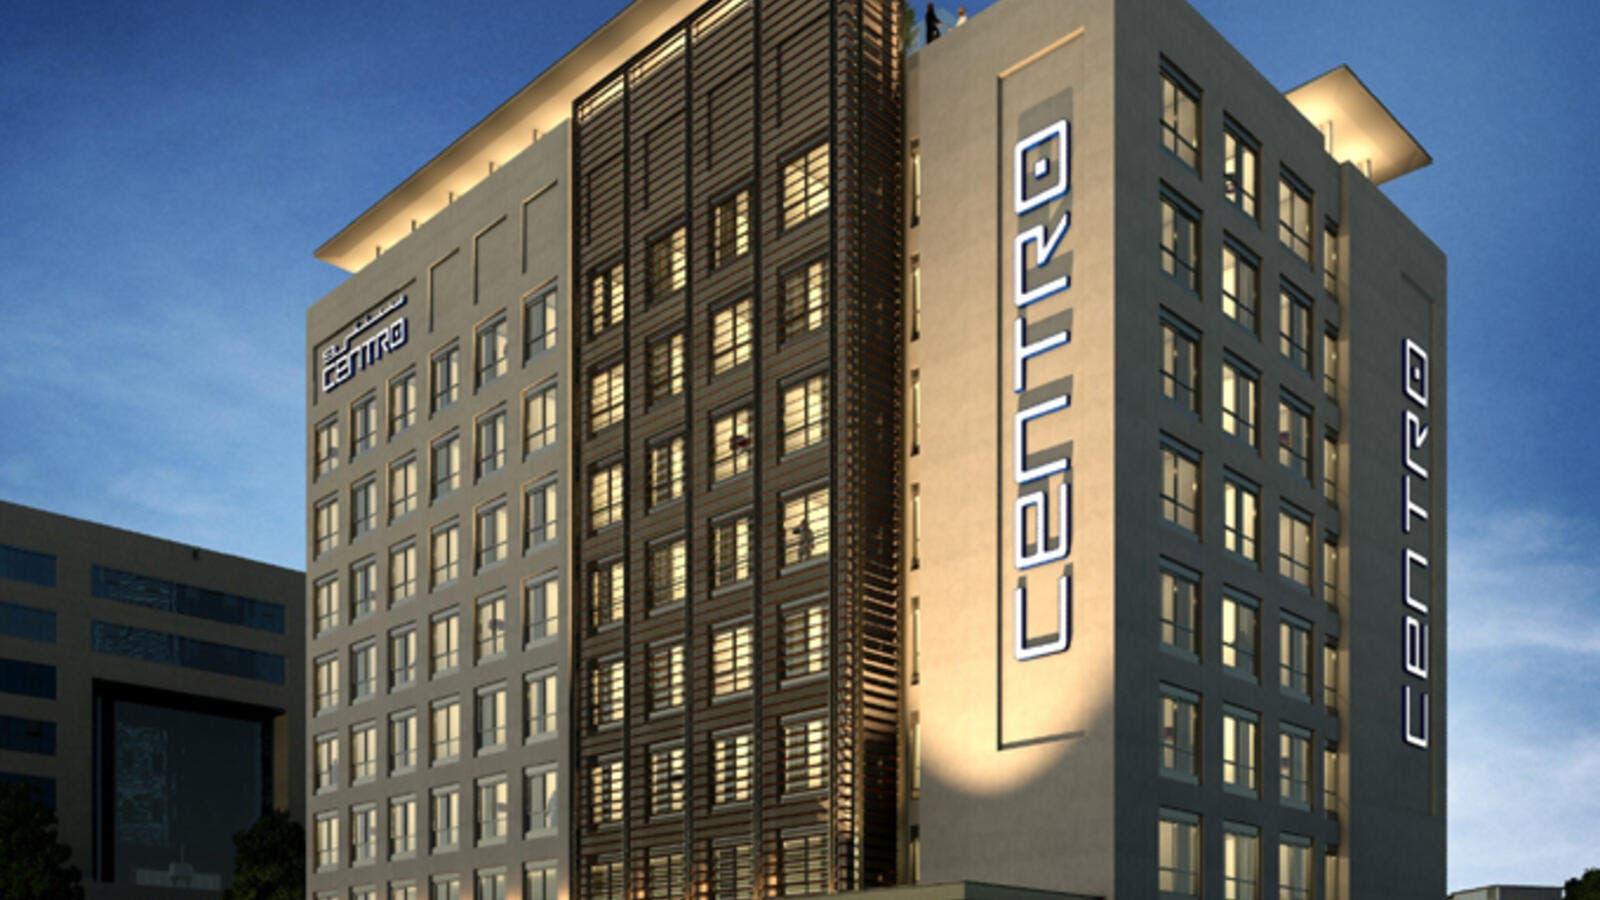 Five 'Centro by Rotana' hotels to open across Saudi Arabia